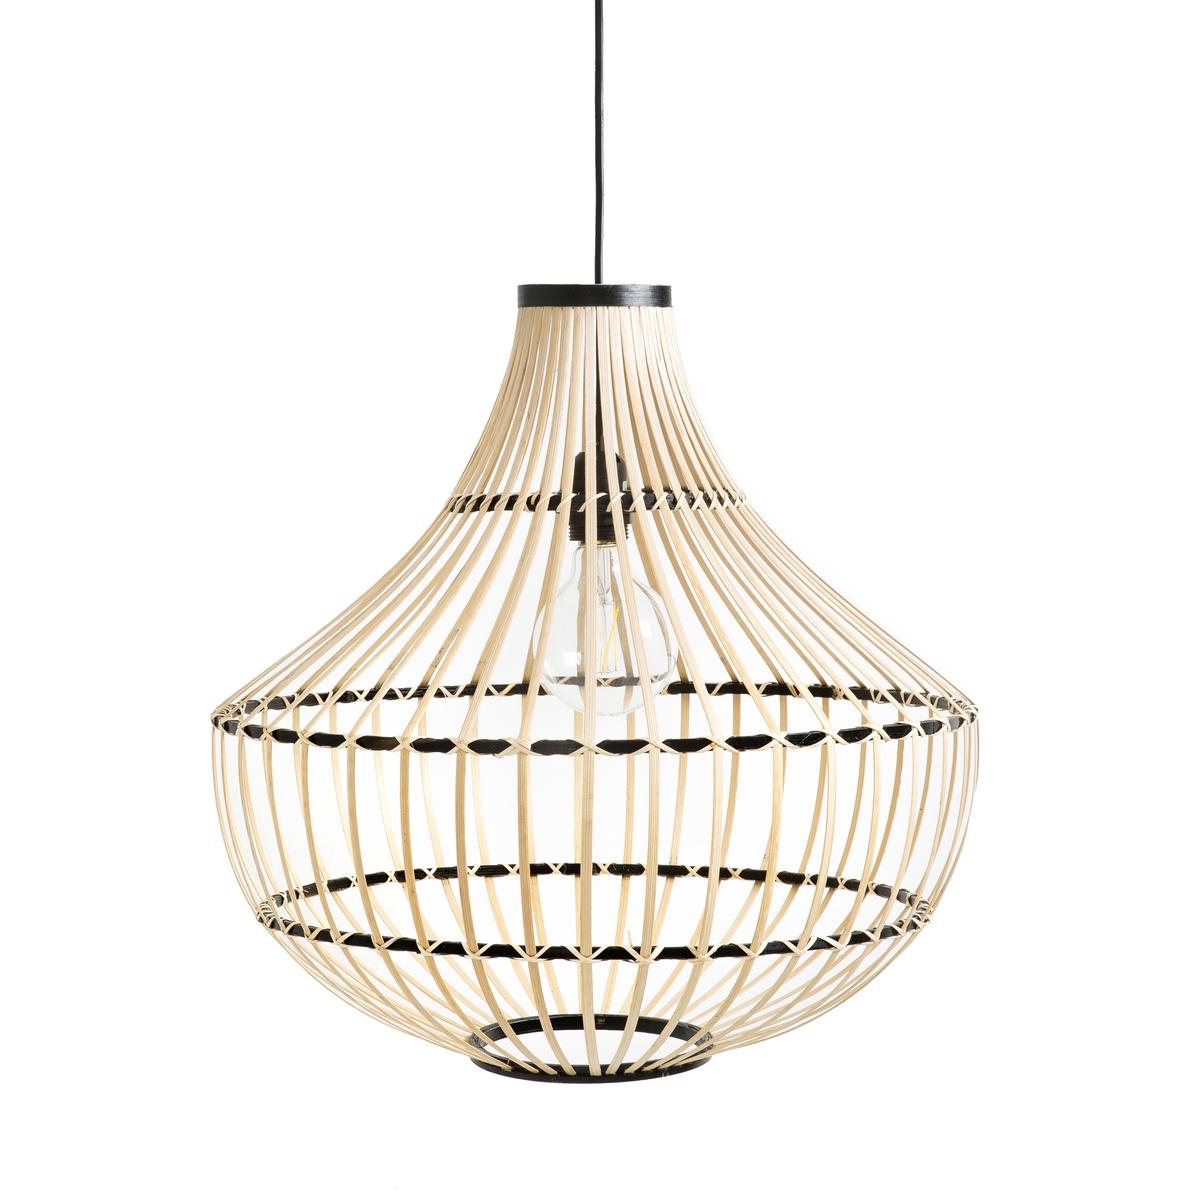 цена Светильник La Redoute Мз бамбука Ilga единый размер бежевый